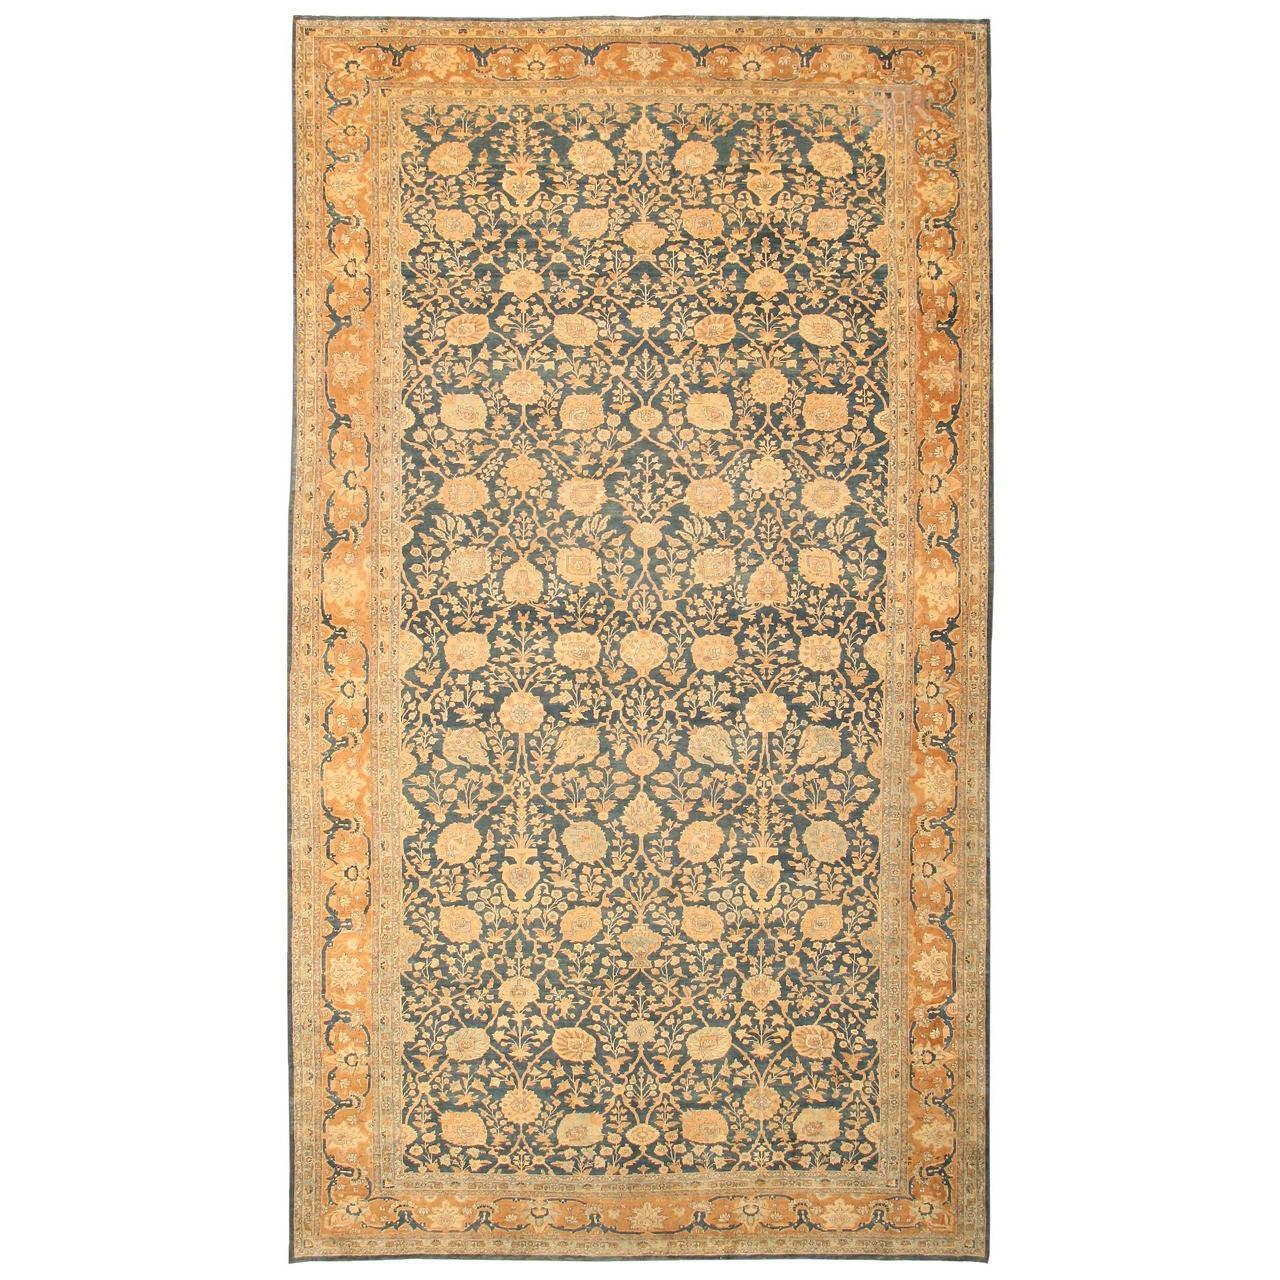 Antique Oriental Tabriz Persian Rug Carpet At 1stdibs